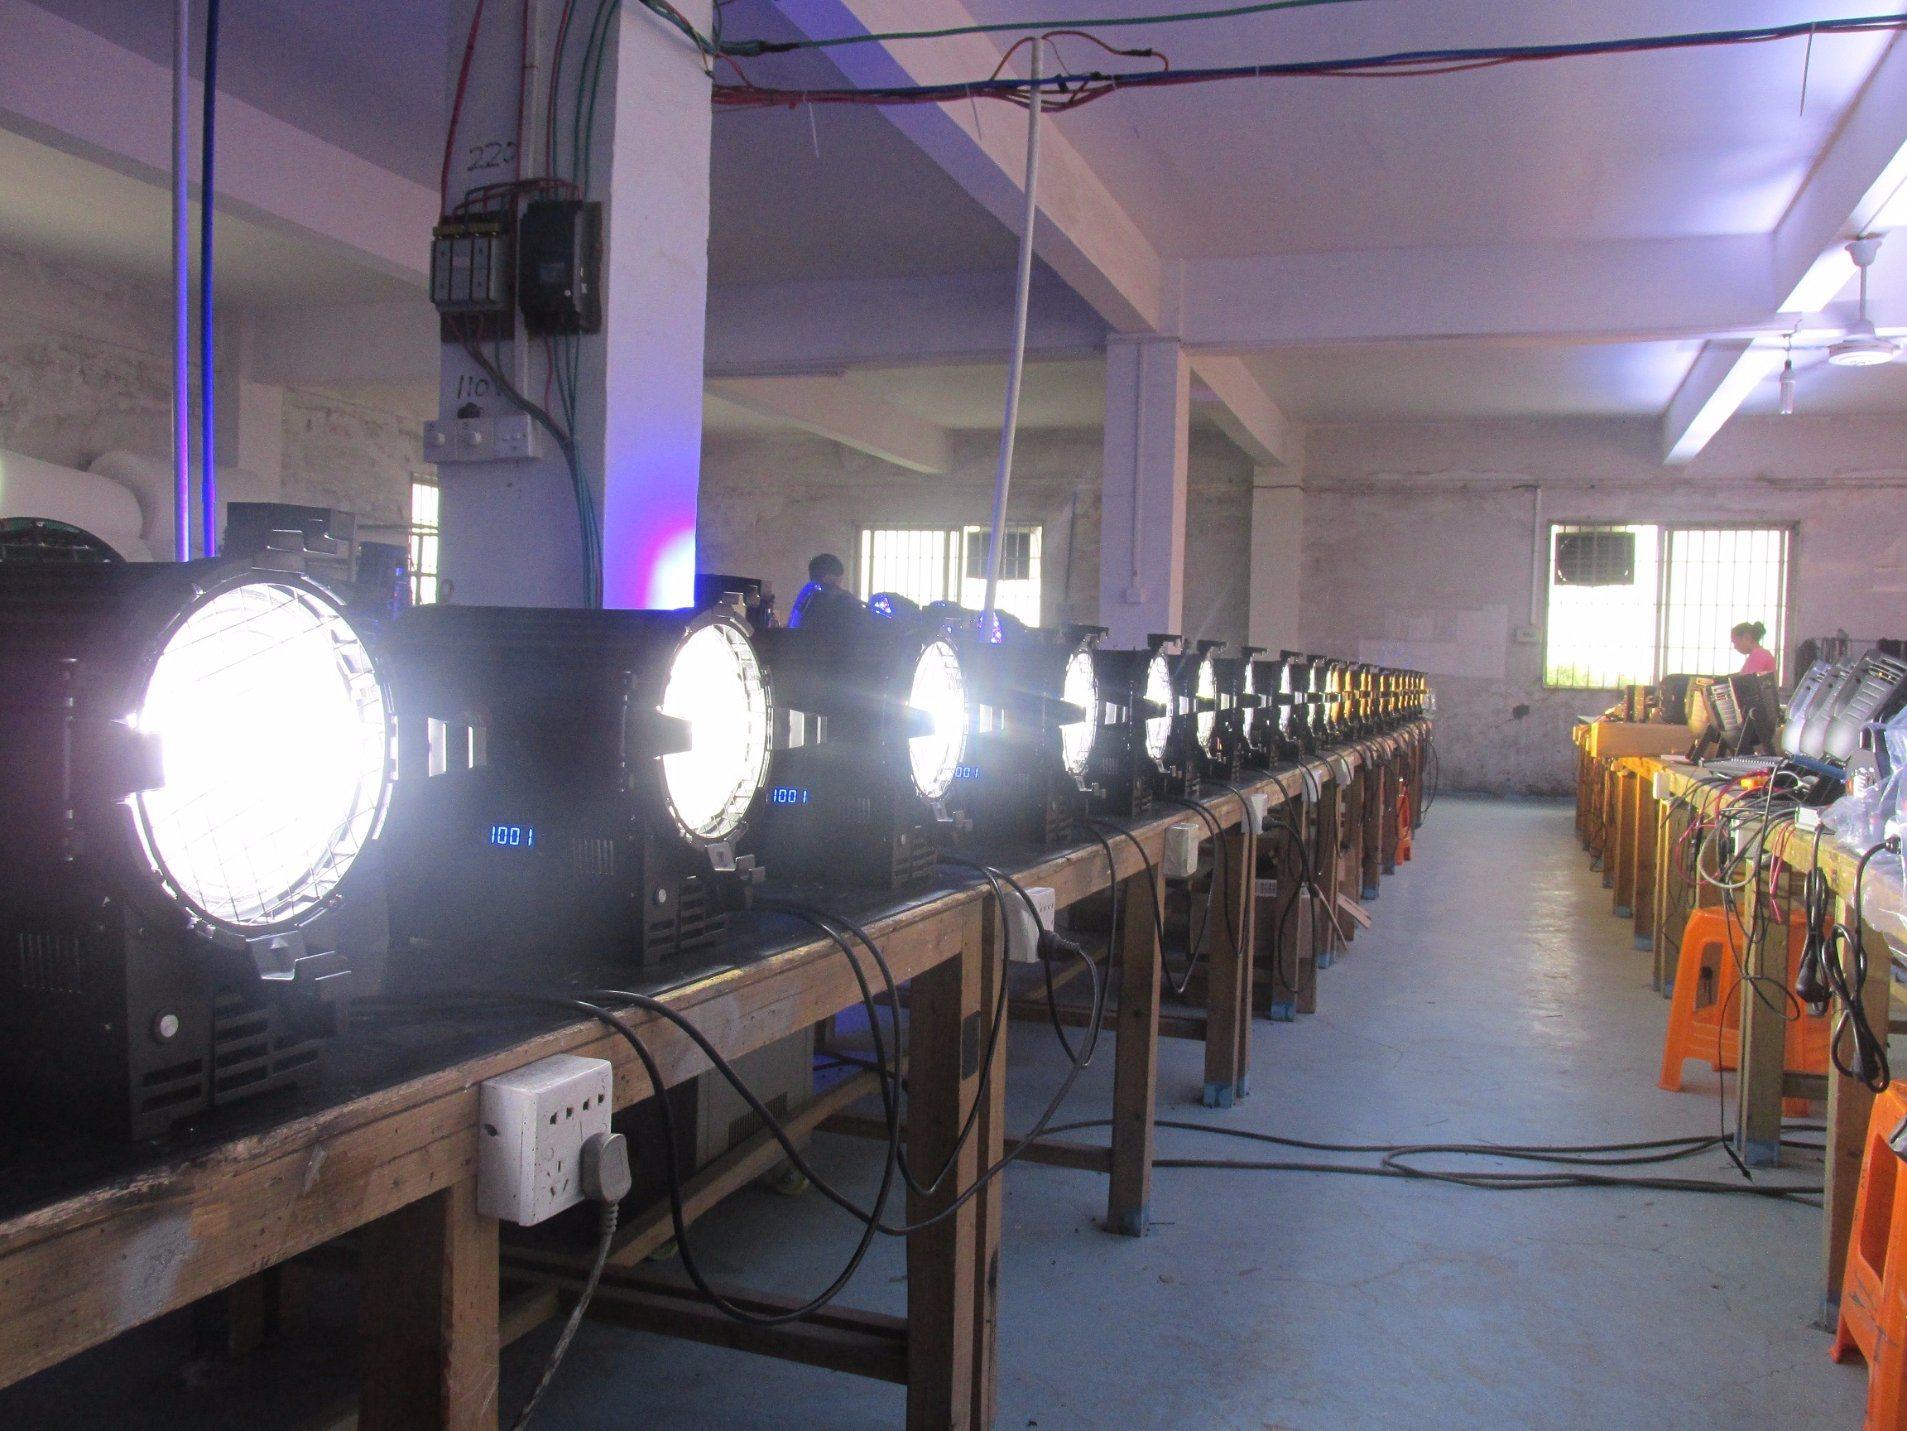 100W/300W COB Cw/Ww/RGB/RGBW/RGBA/RGBWA/Rgbwauv LED Profile Ellipsoidal Spot Light